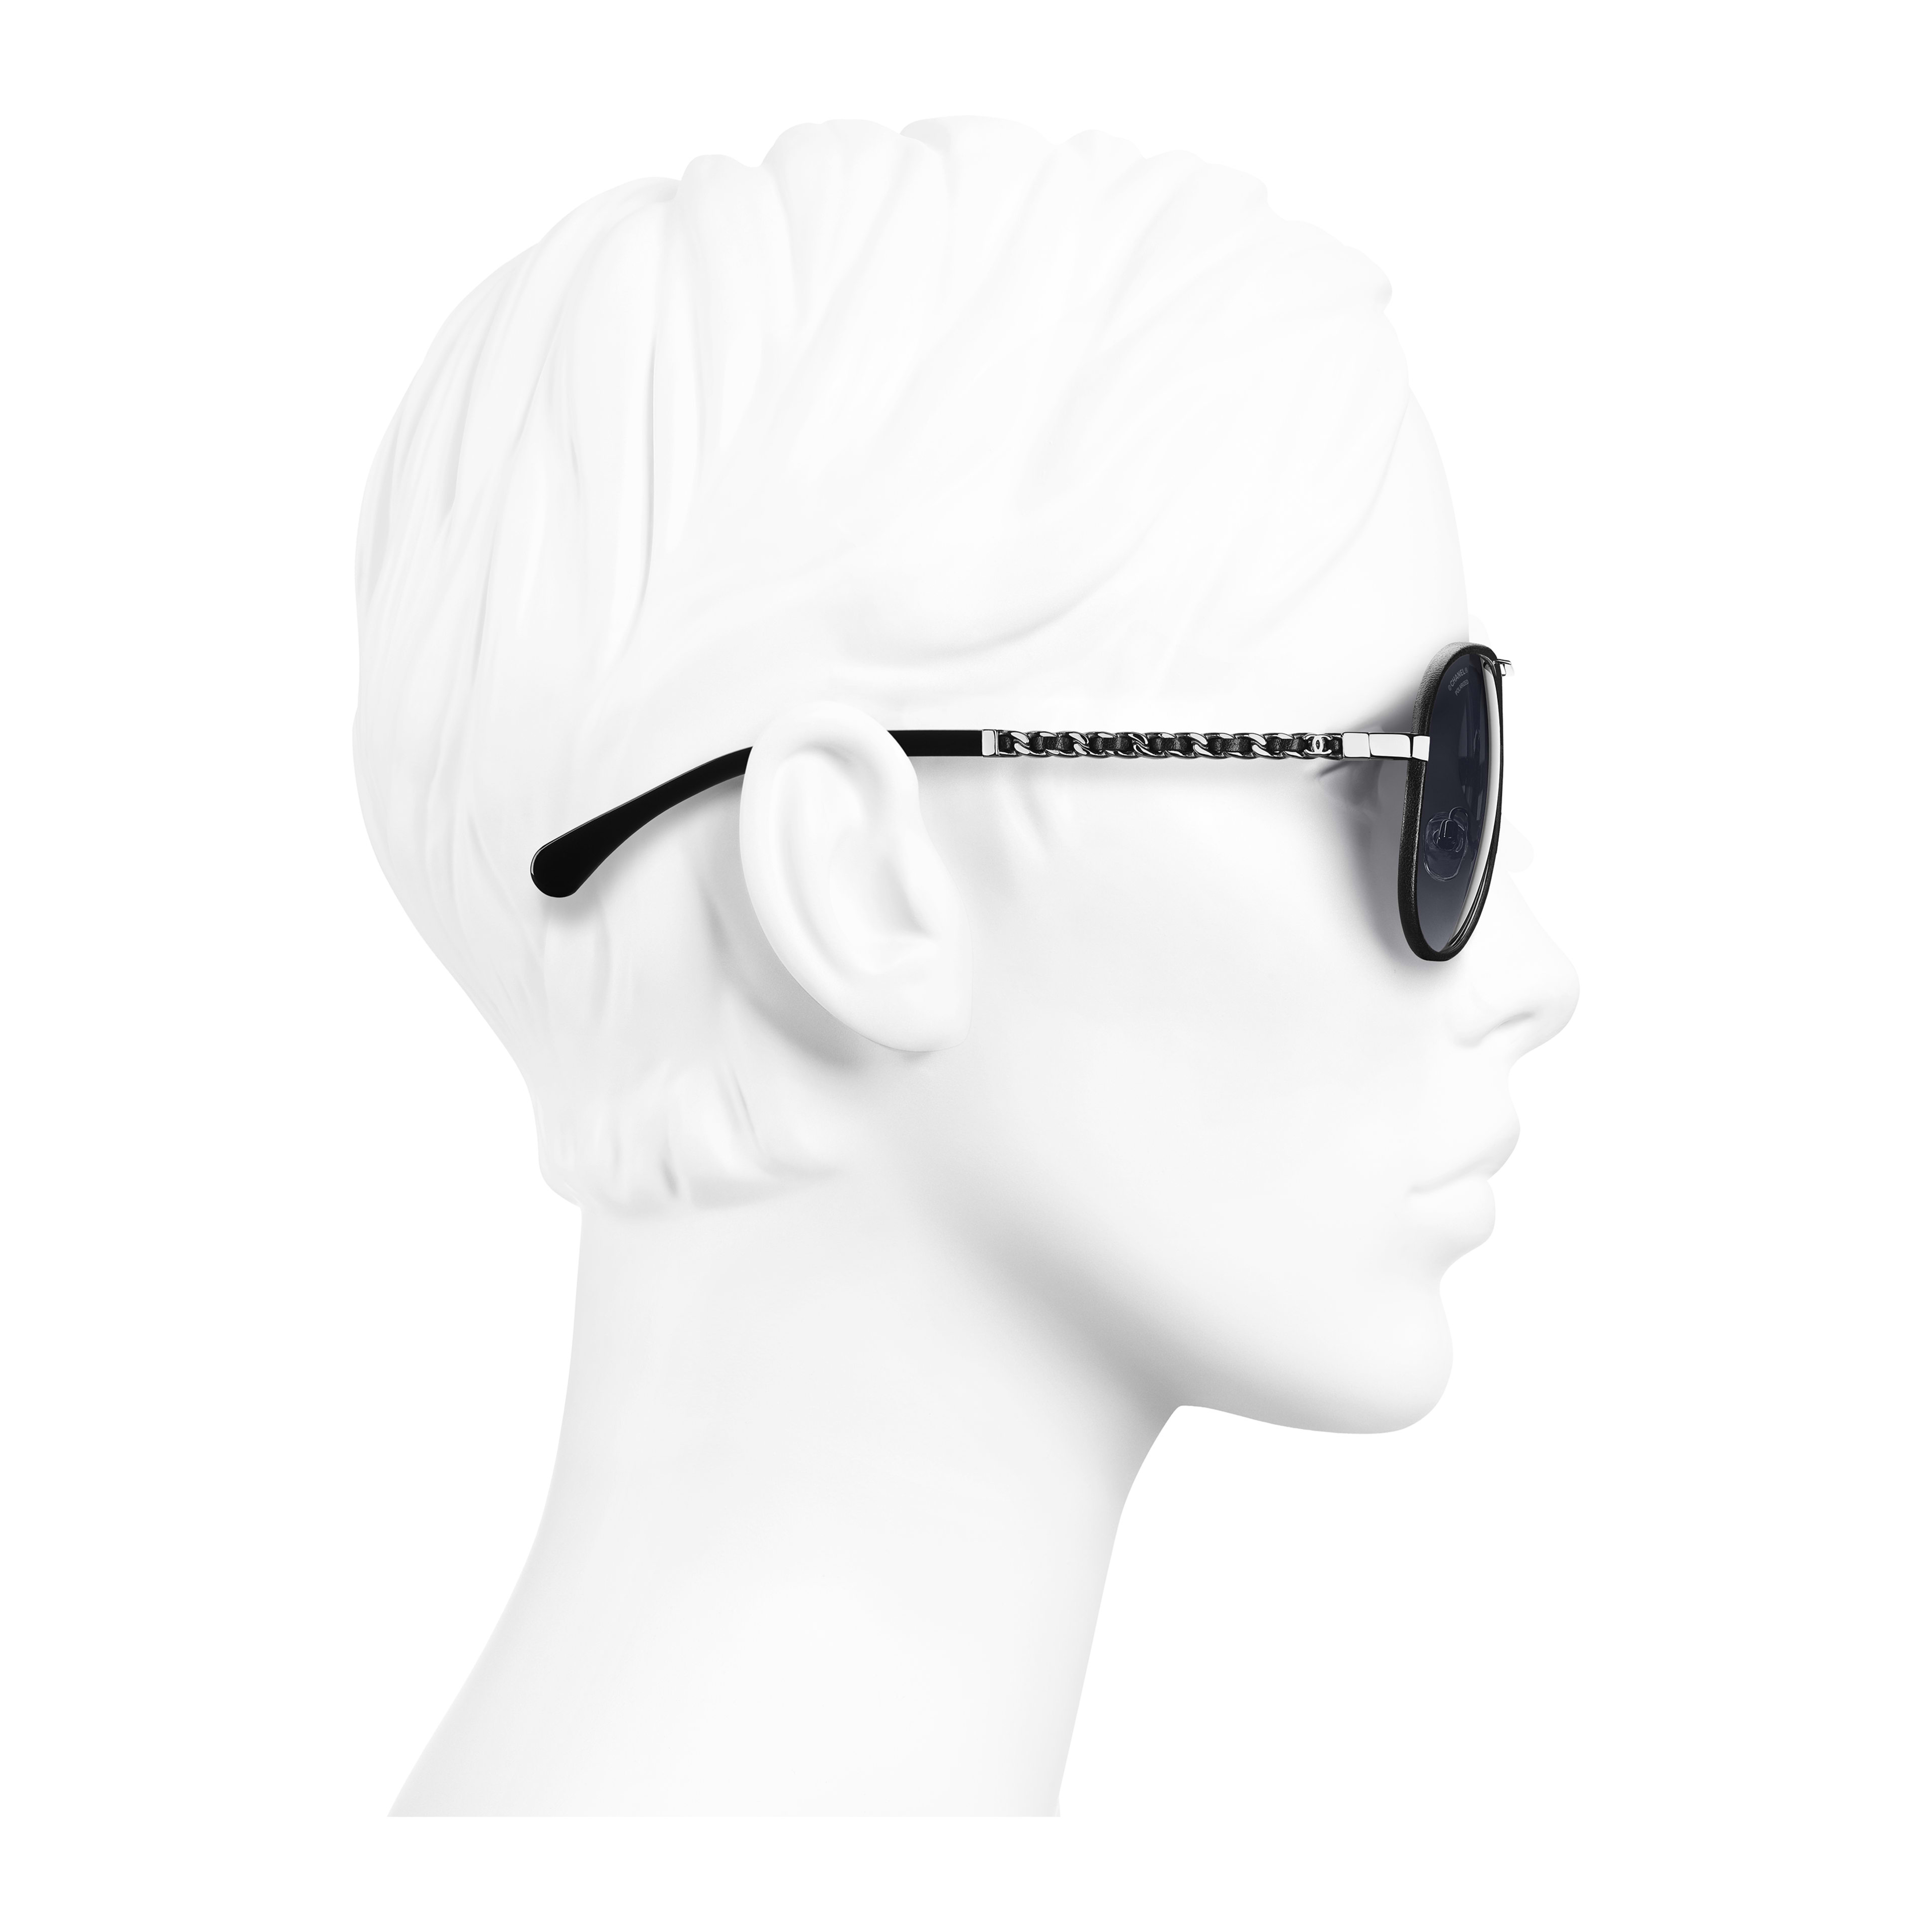 Pilot Sunglasses - Black - Metal & Calfskin - Polarized Lenses - Worn side view - see full sized version